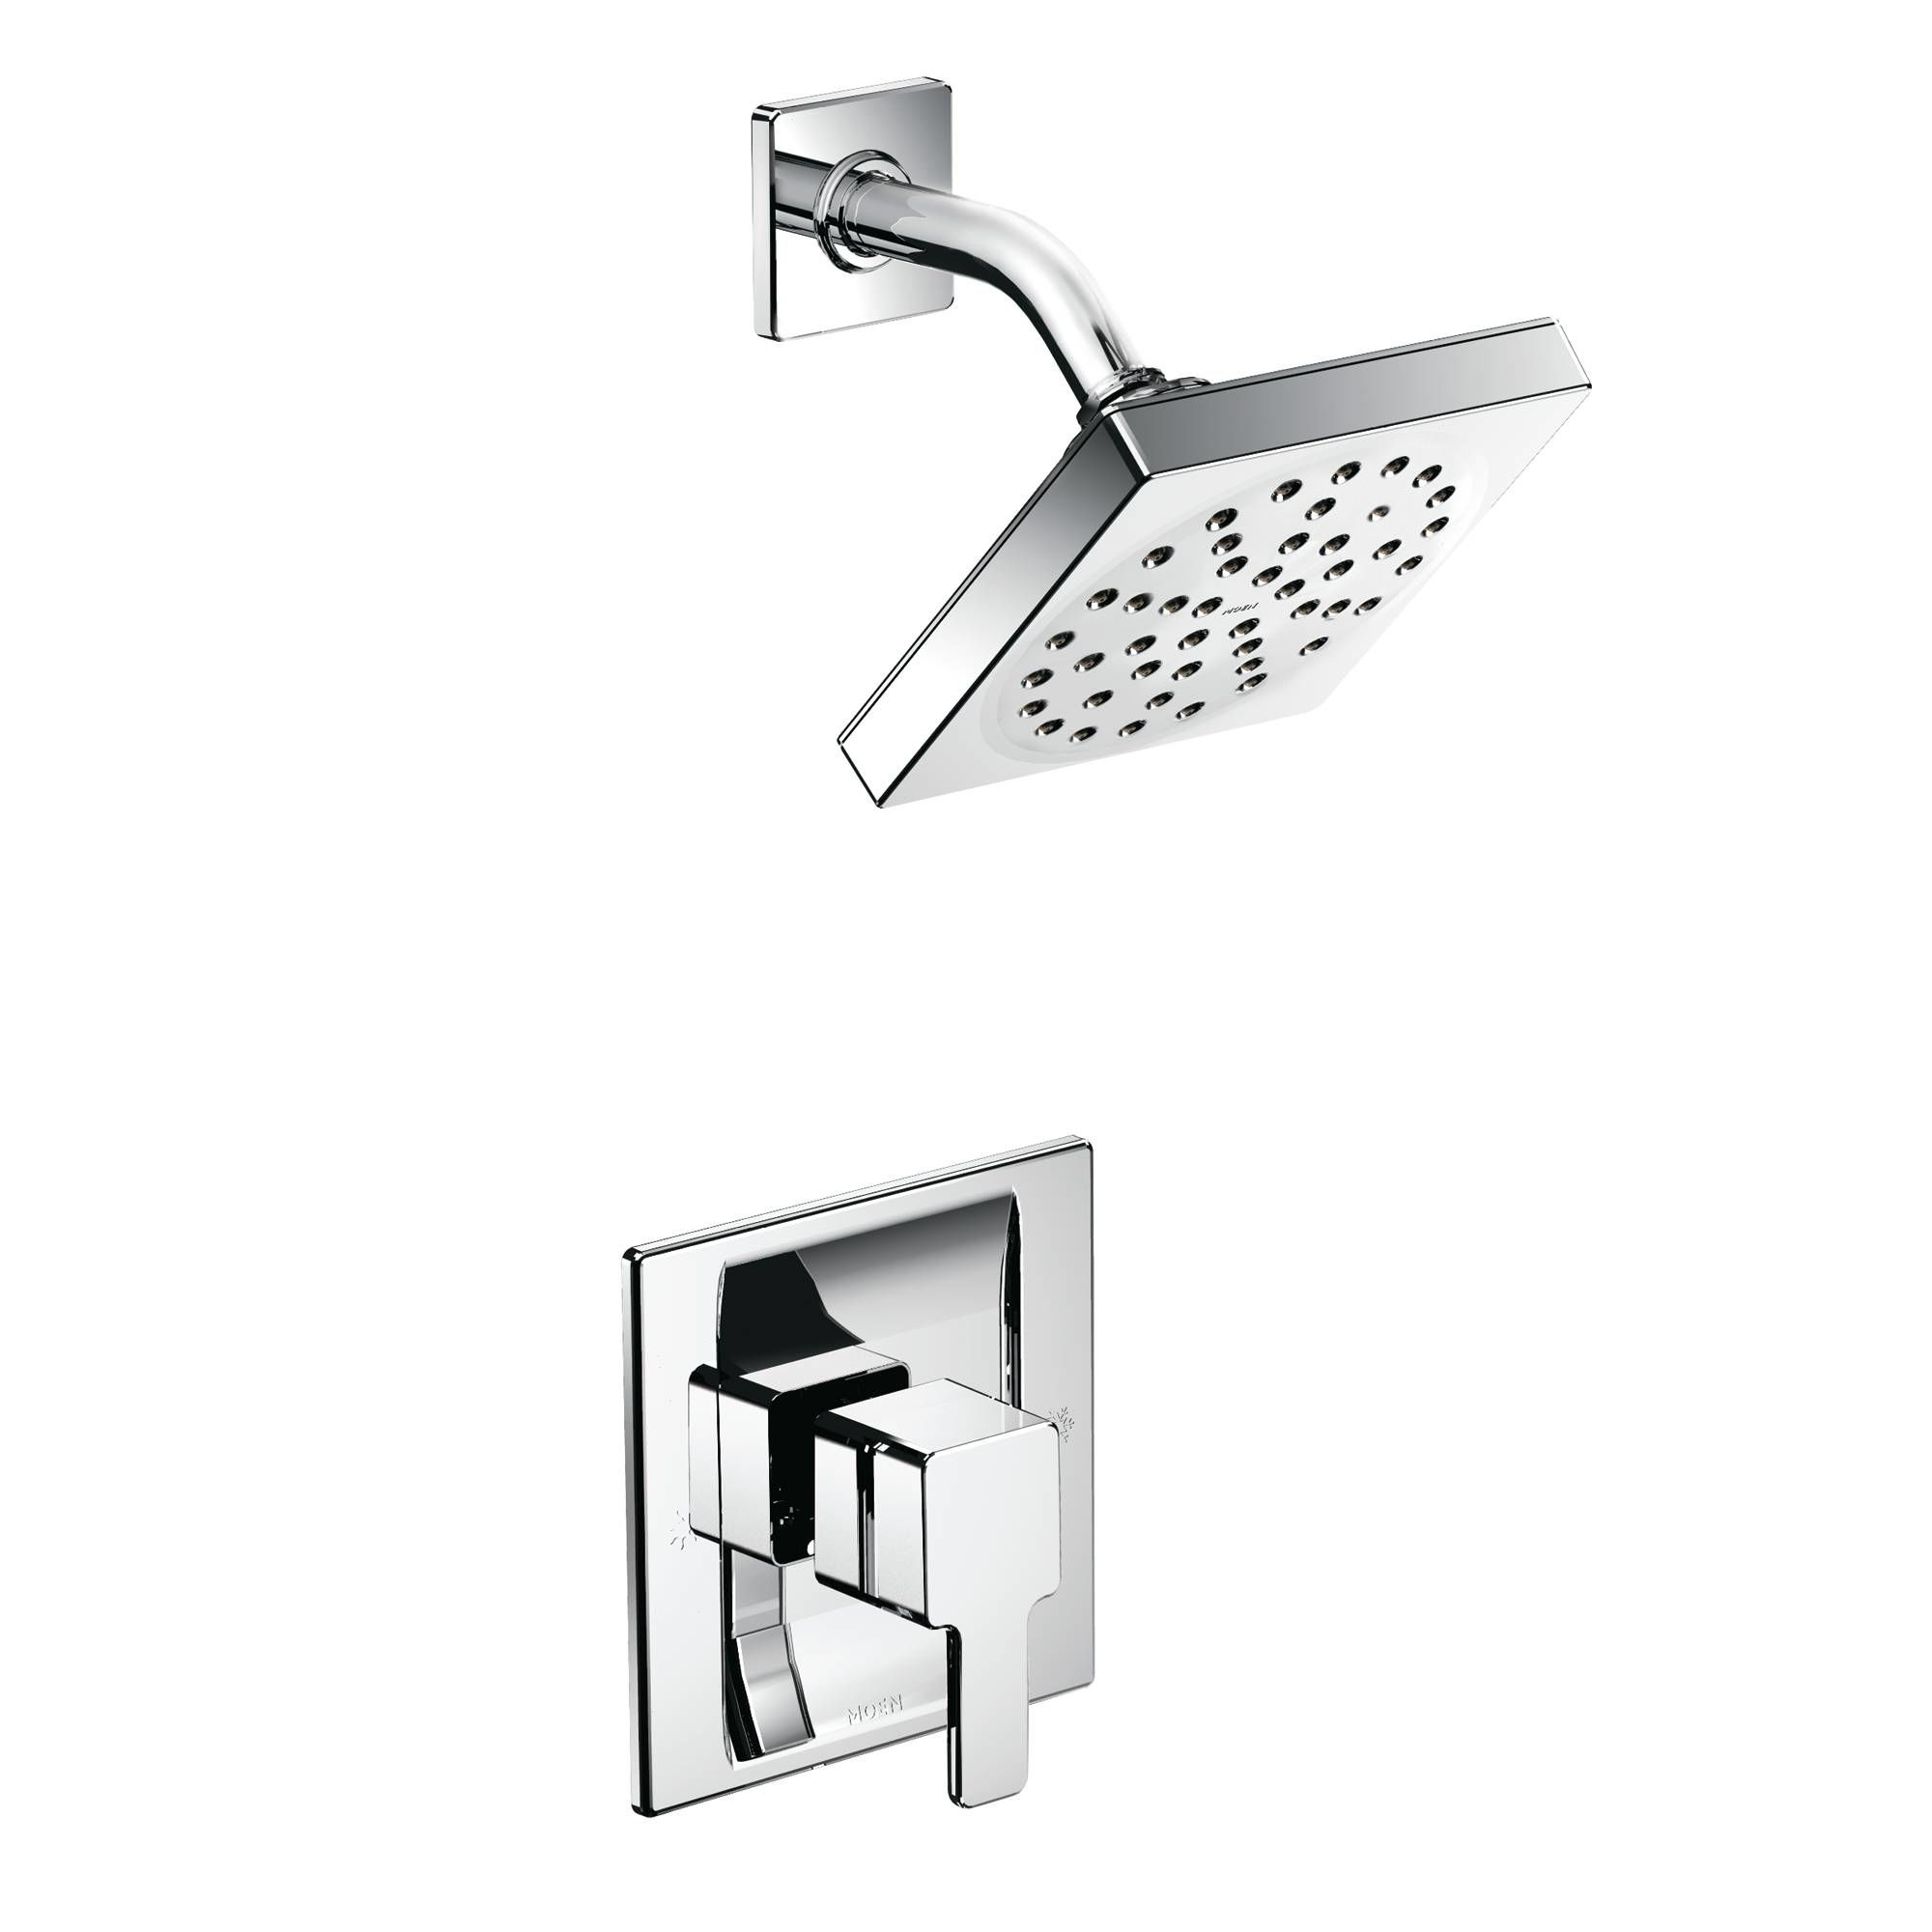 Moen 825BN Brushed Nickel Posi-Temp Shower System with Rain Shower ...